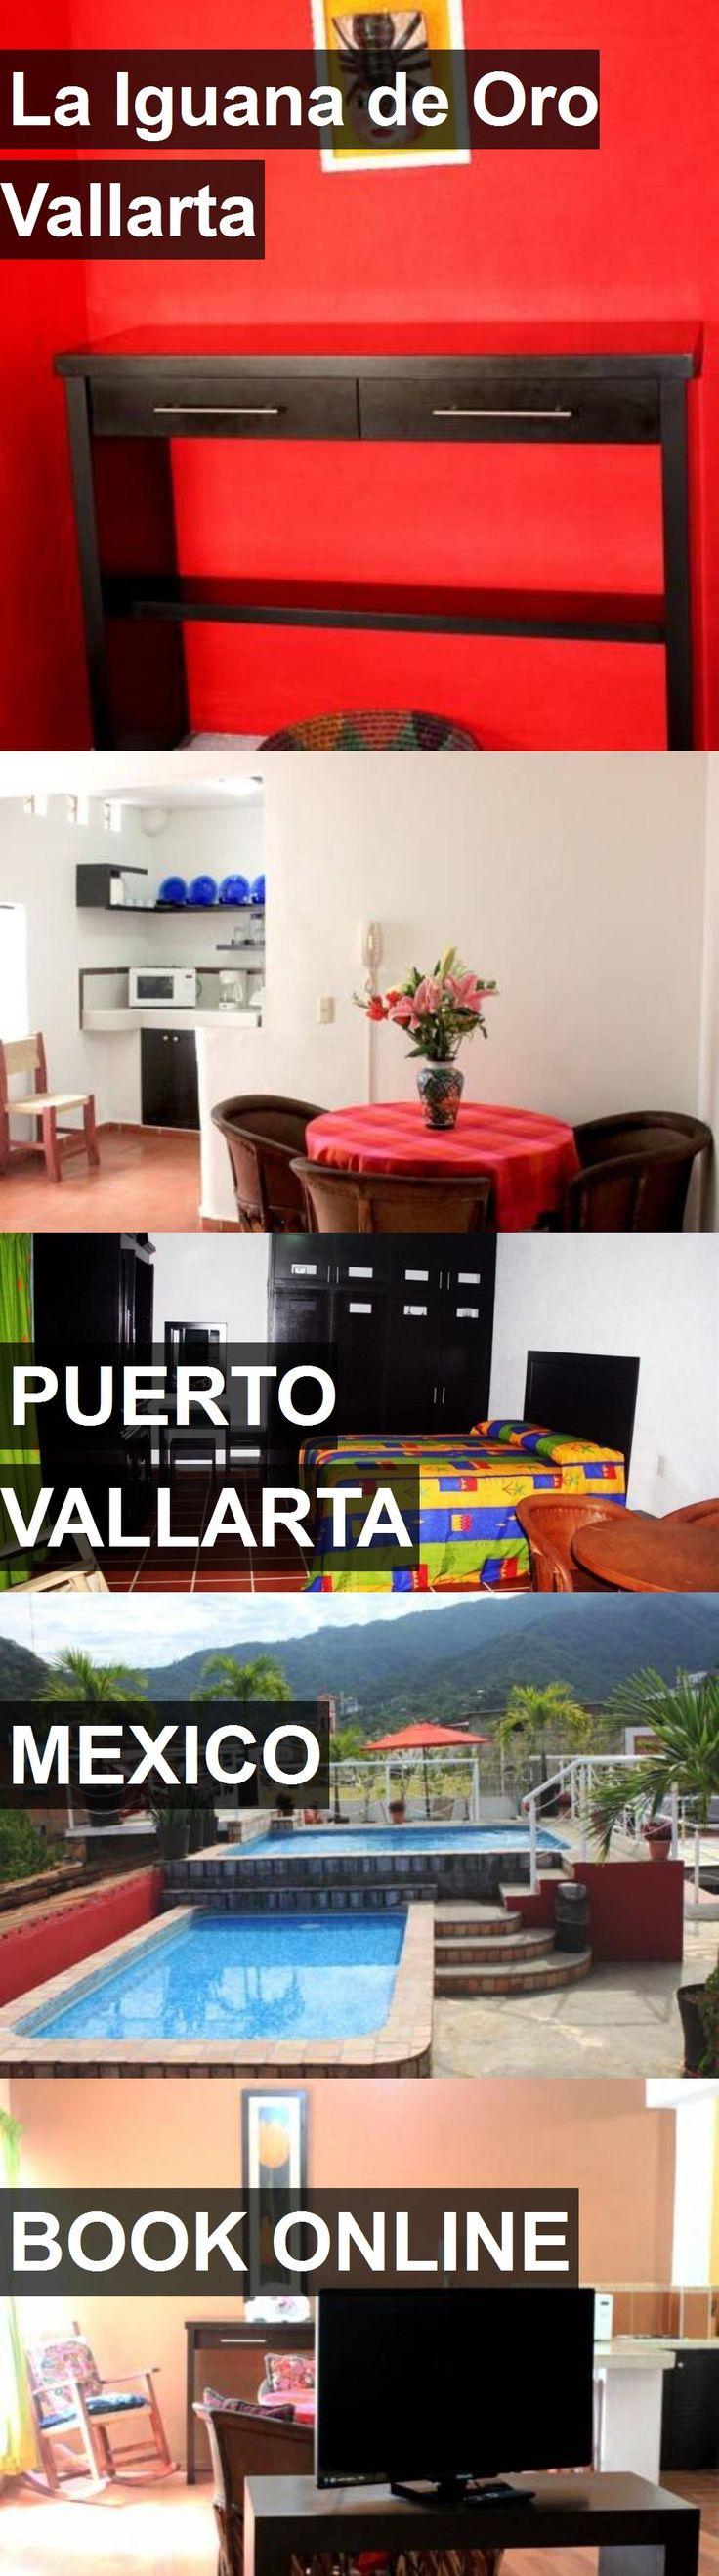 Hotel La Iguana de Oro Vallarta in Puerto Vallarta, Mexico. For more information, photos, reviews and best prices please follow the link. #Mexico #PuertoVallarta #hotel #travel #vacation